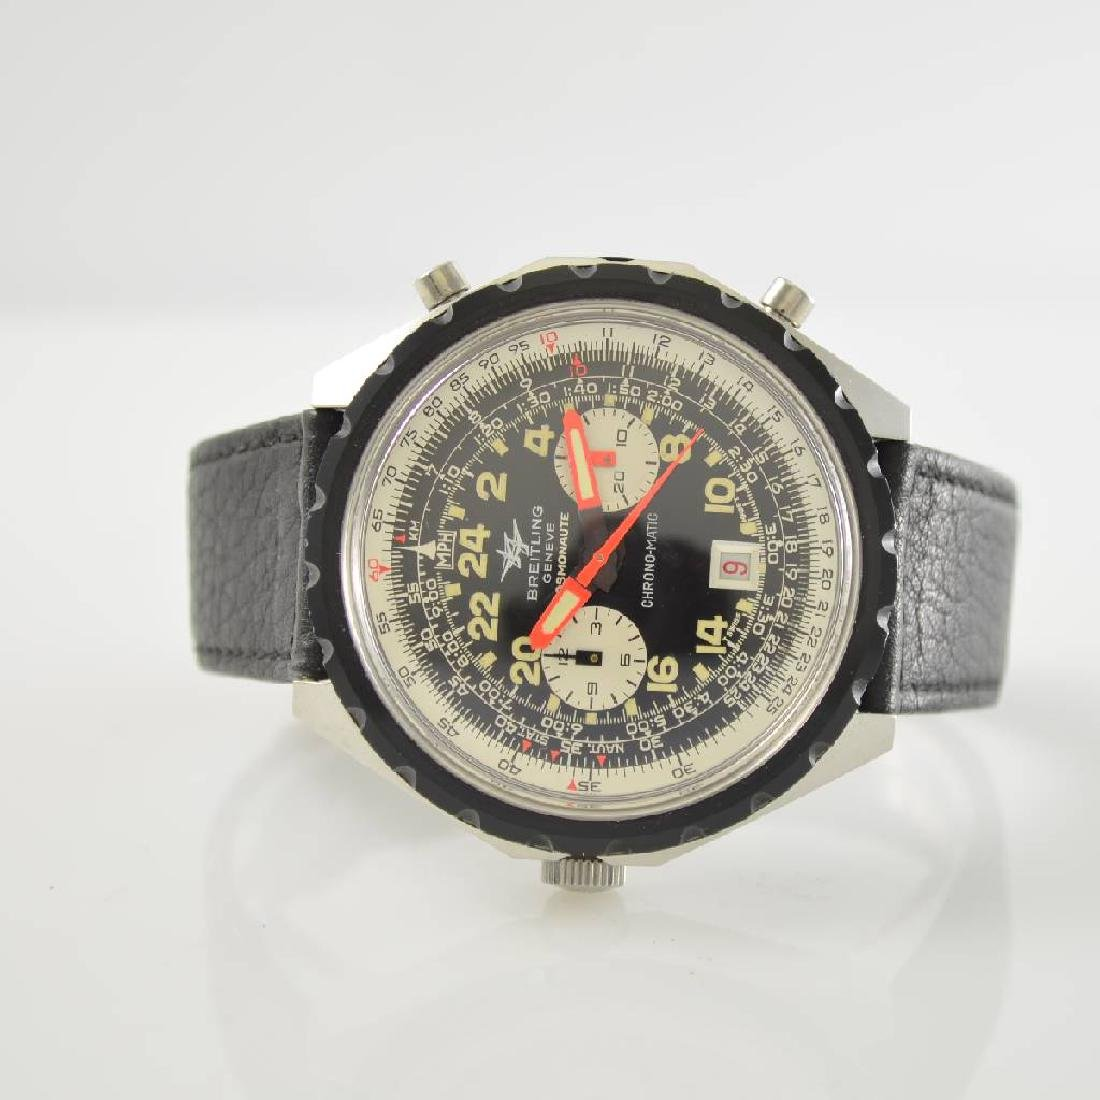 BREITLING chronograph Chrono-Matic Cosmonaute